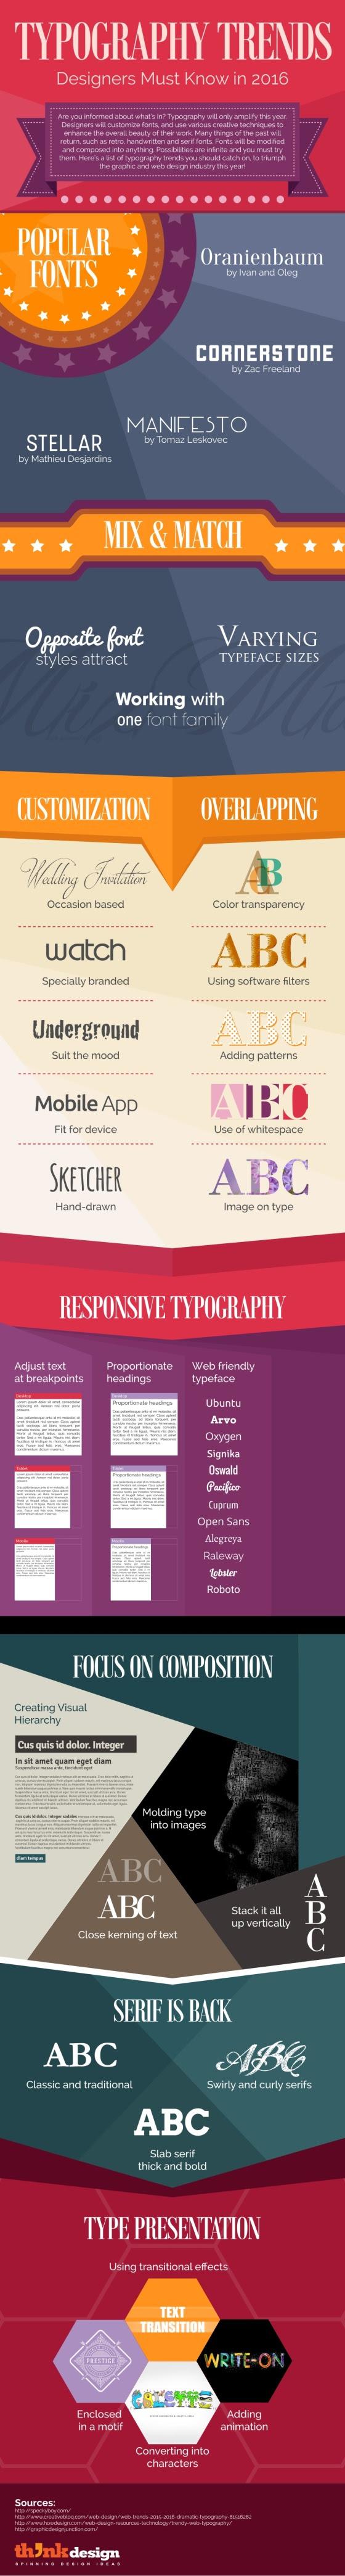 Tendencias sobre Tipografía